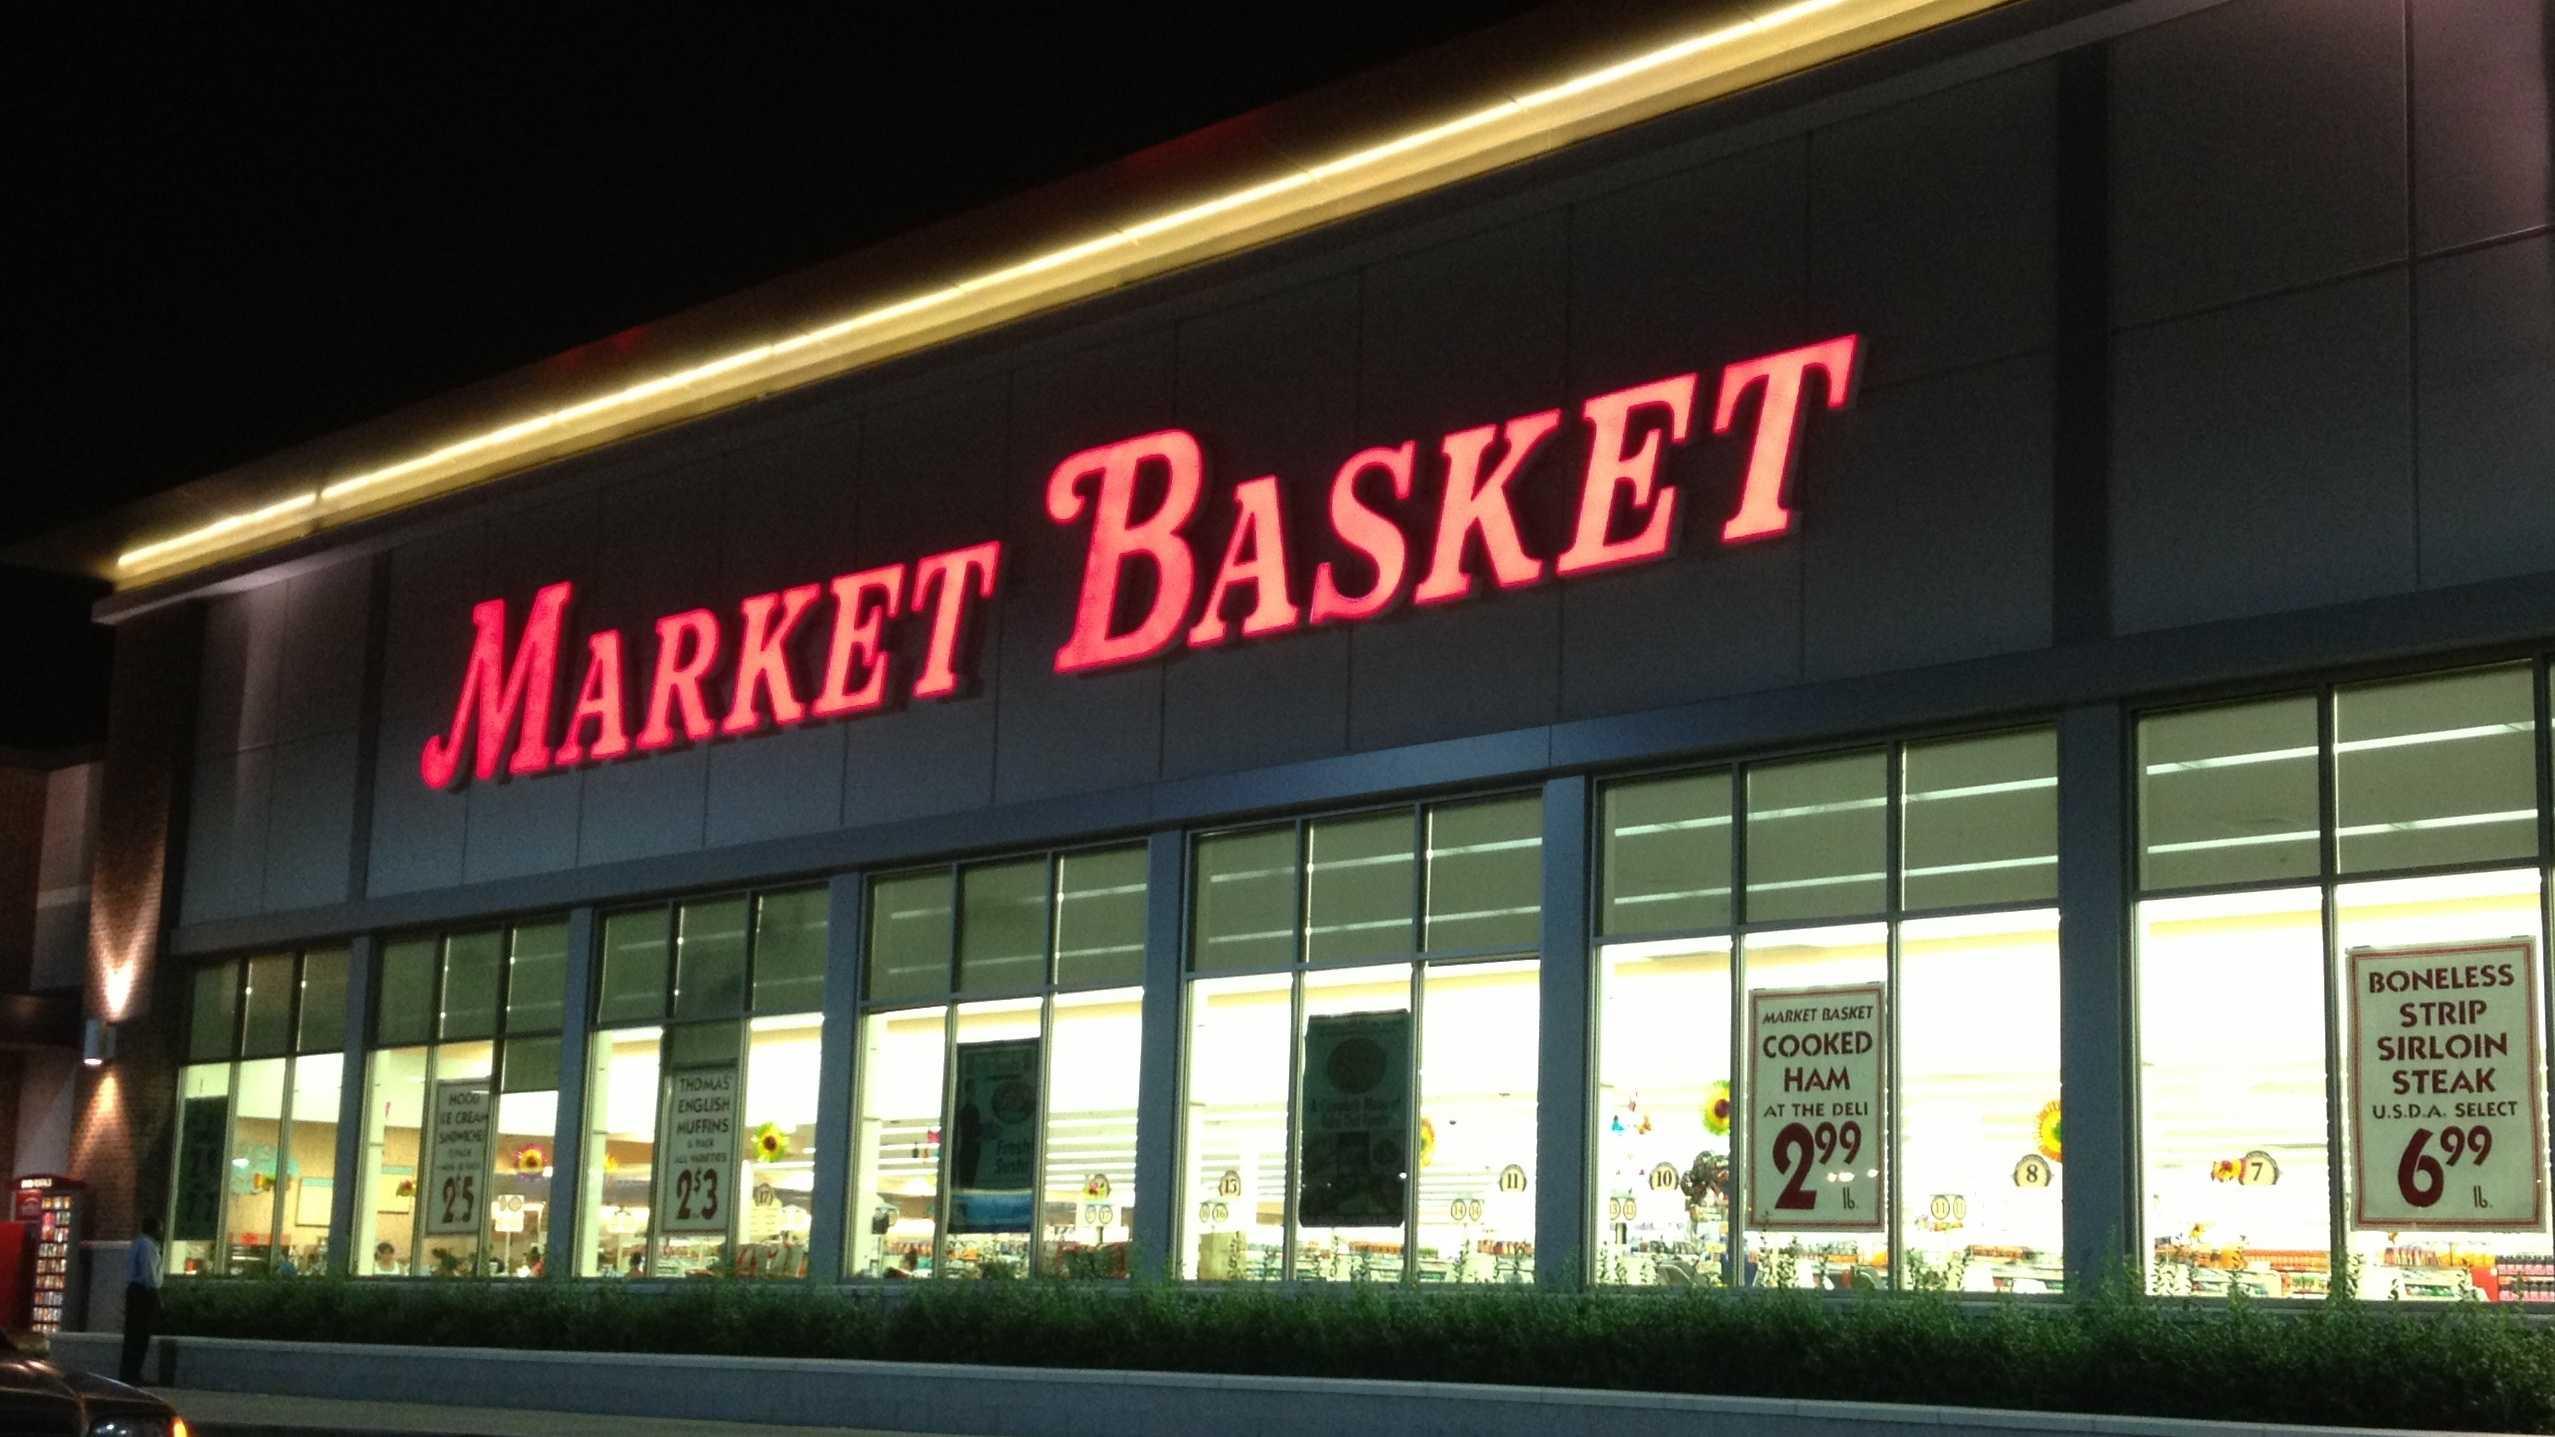 Market Basket 071813.JPG